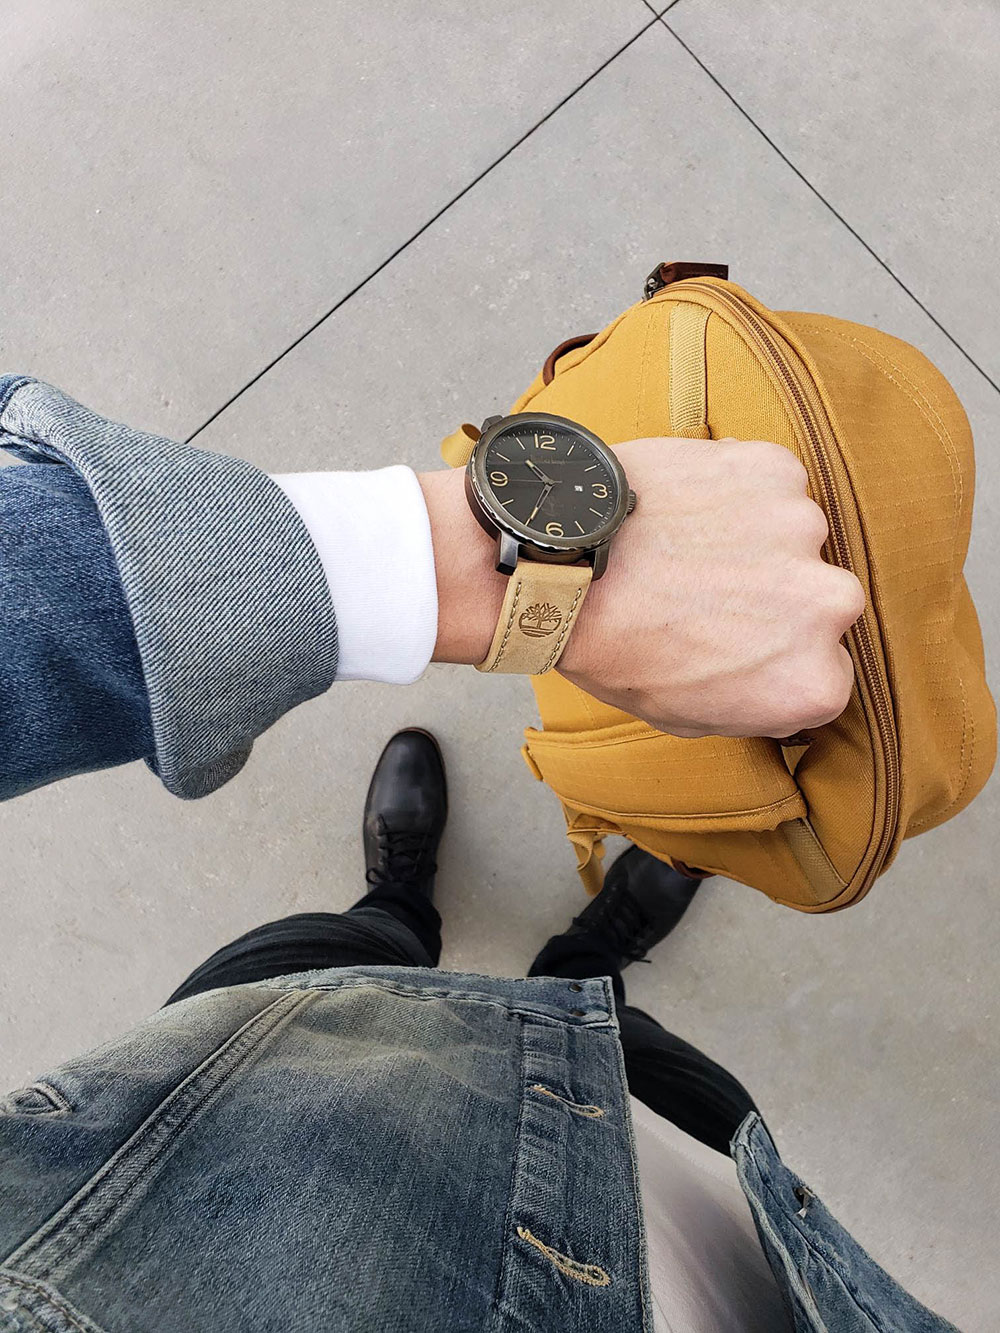 Timberland Watch and Bag